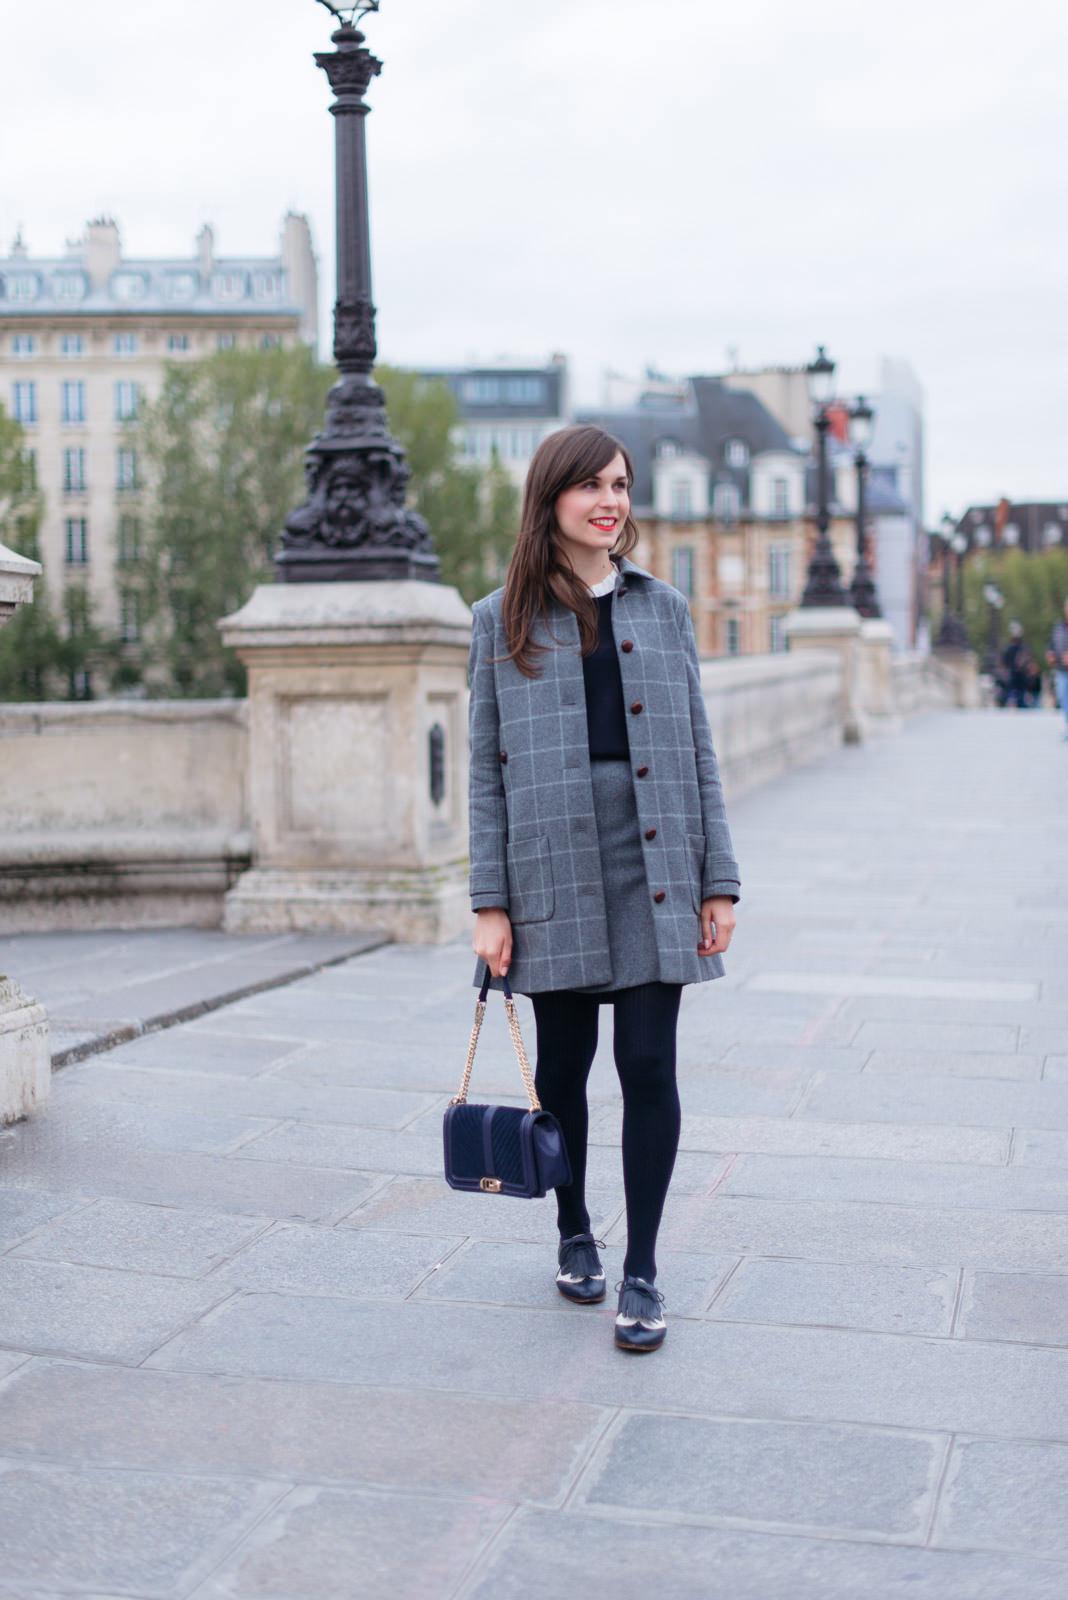 Blog-Mode-And-The-City-Looks-Manteau-Ringo-Sezane-carreaux-2